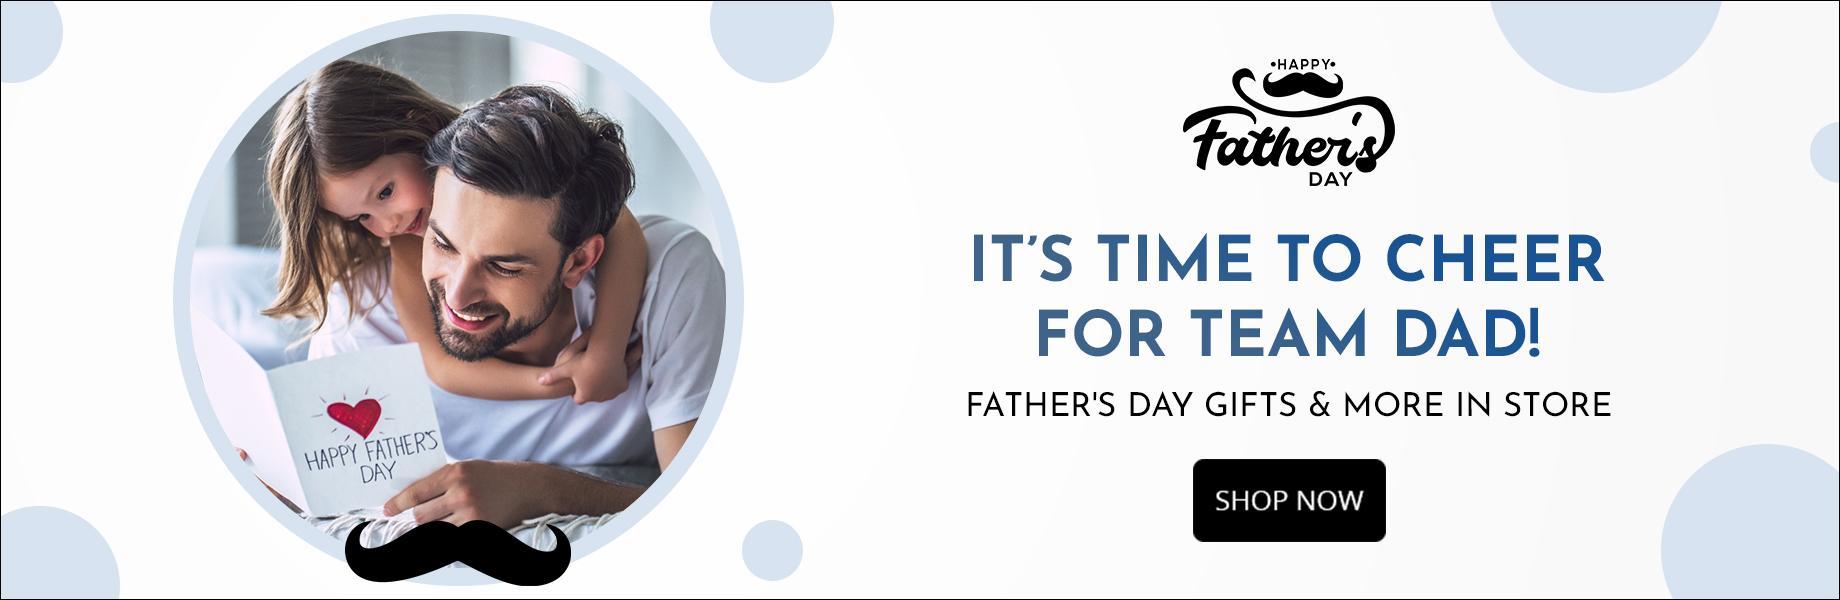 father'day02_web.jpg